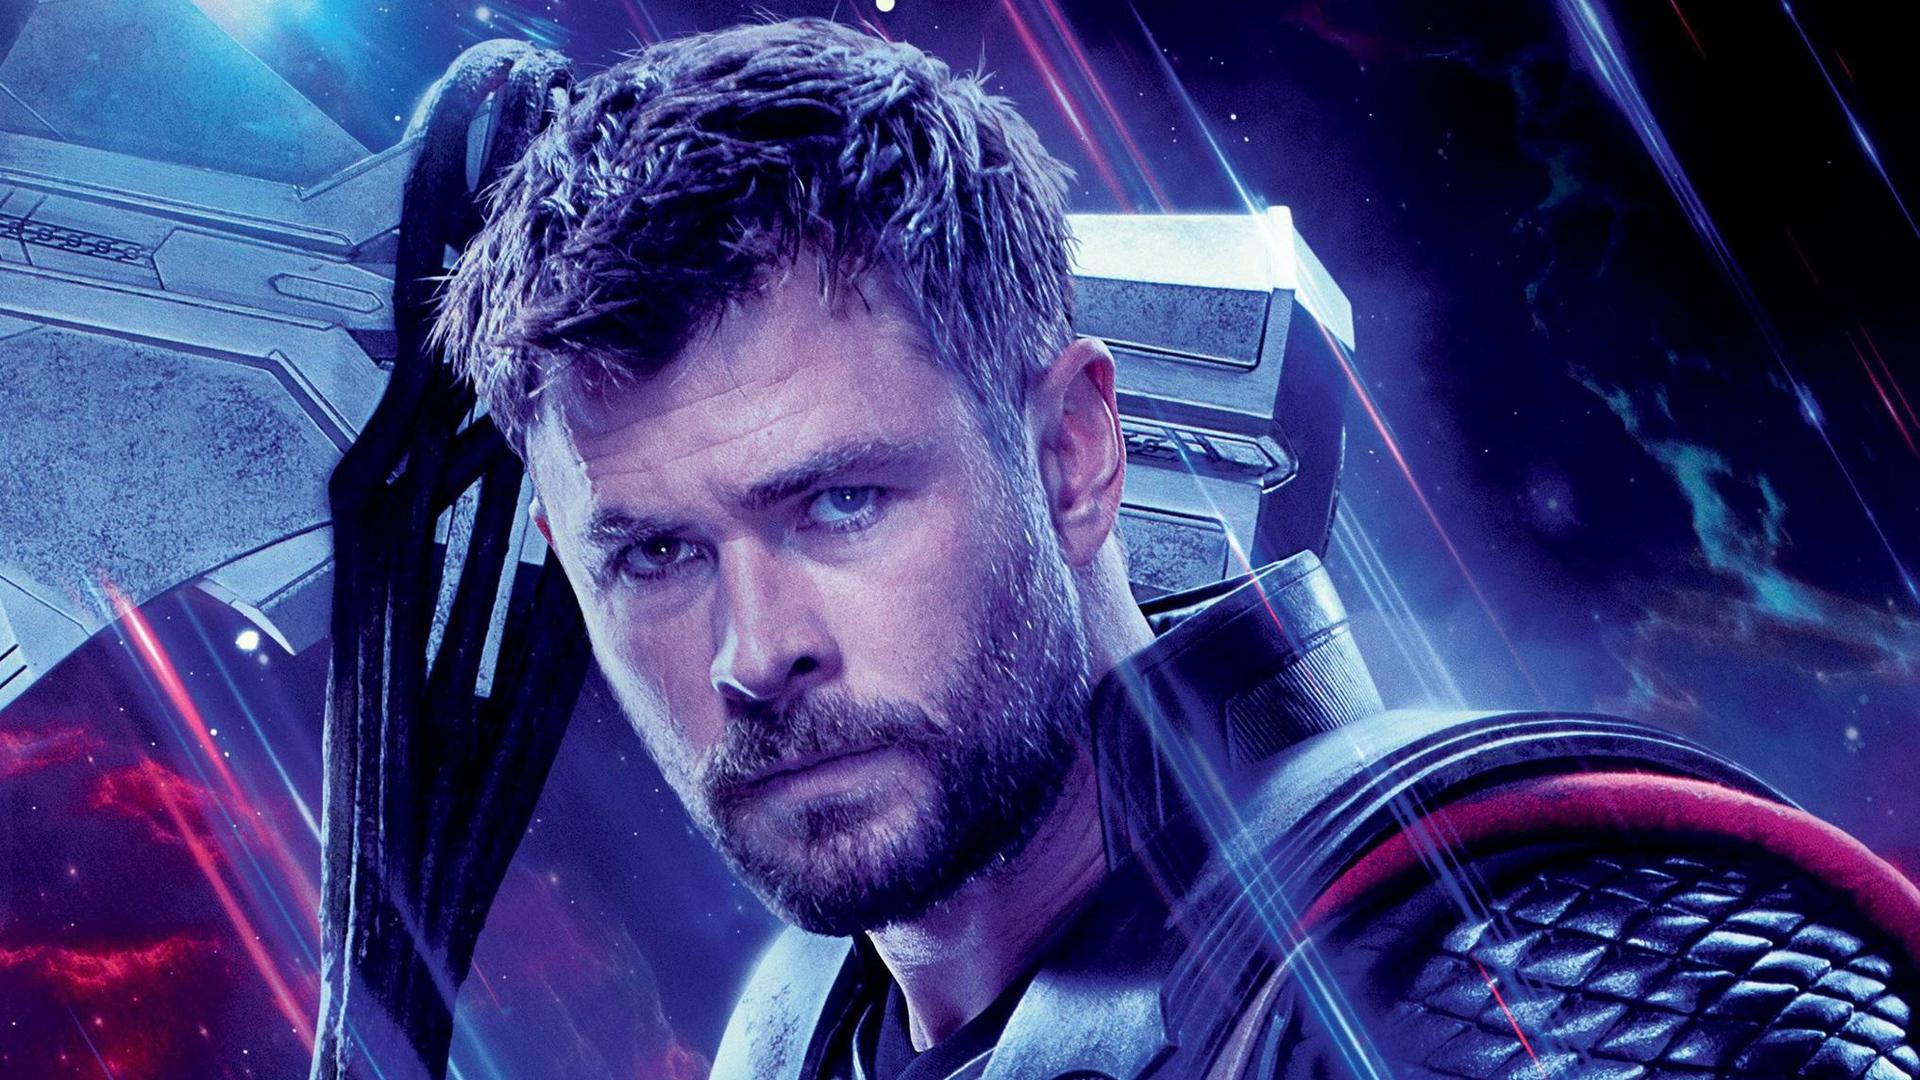 1920x1080 Thor In Avengers Endgame Laptop Full HD 1080P HD ...